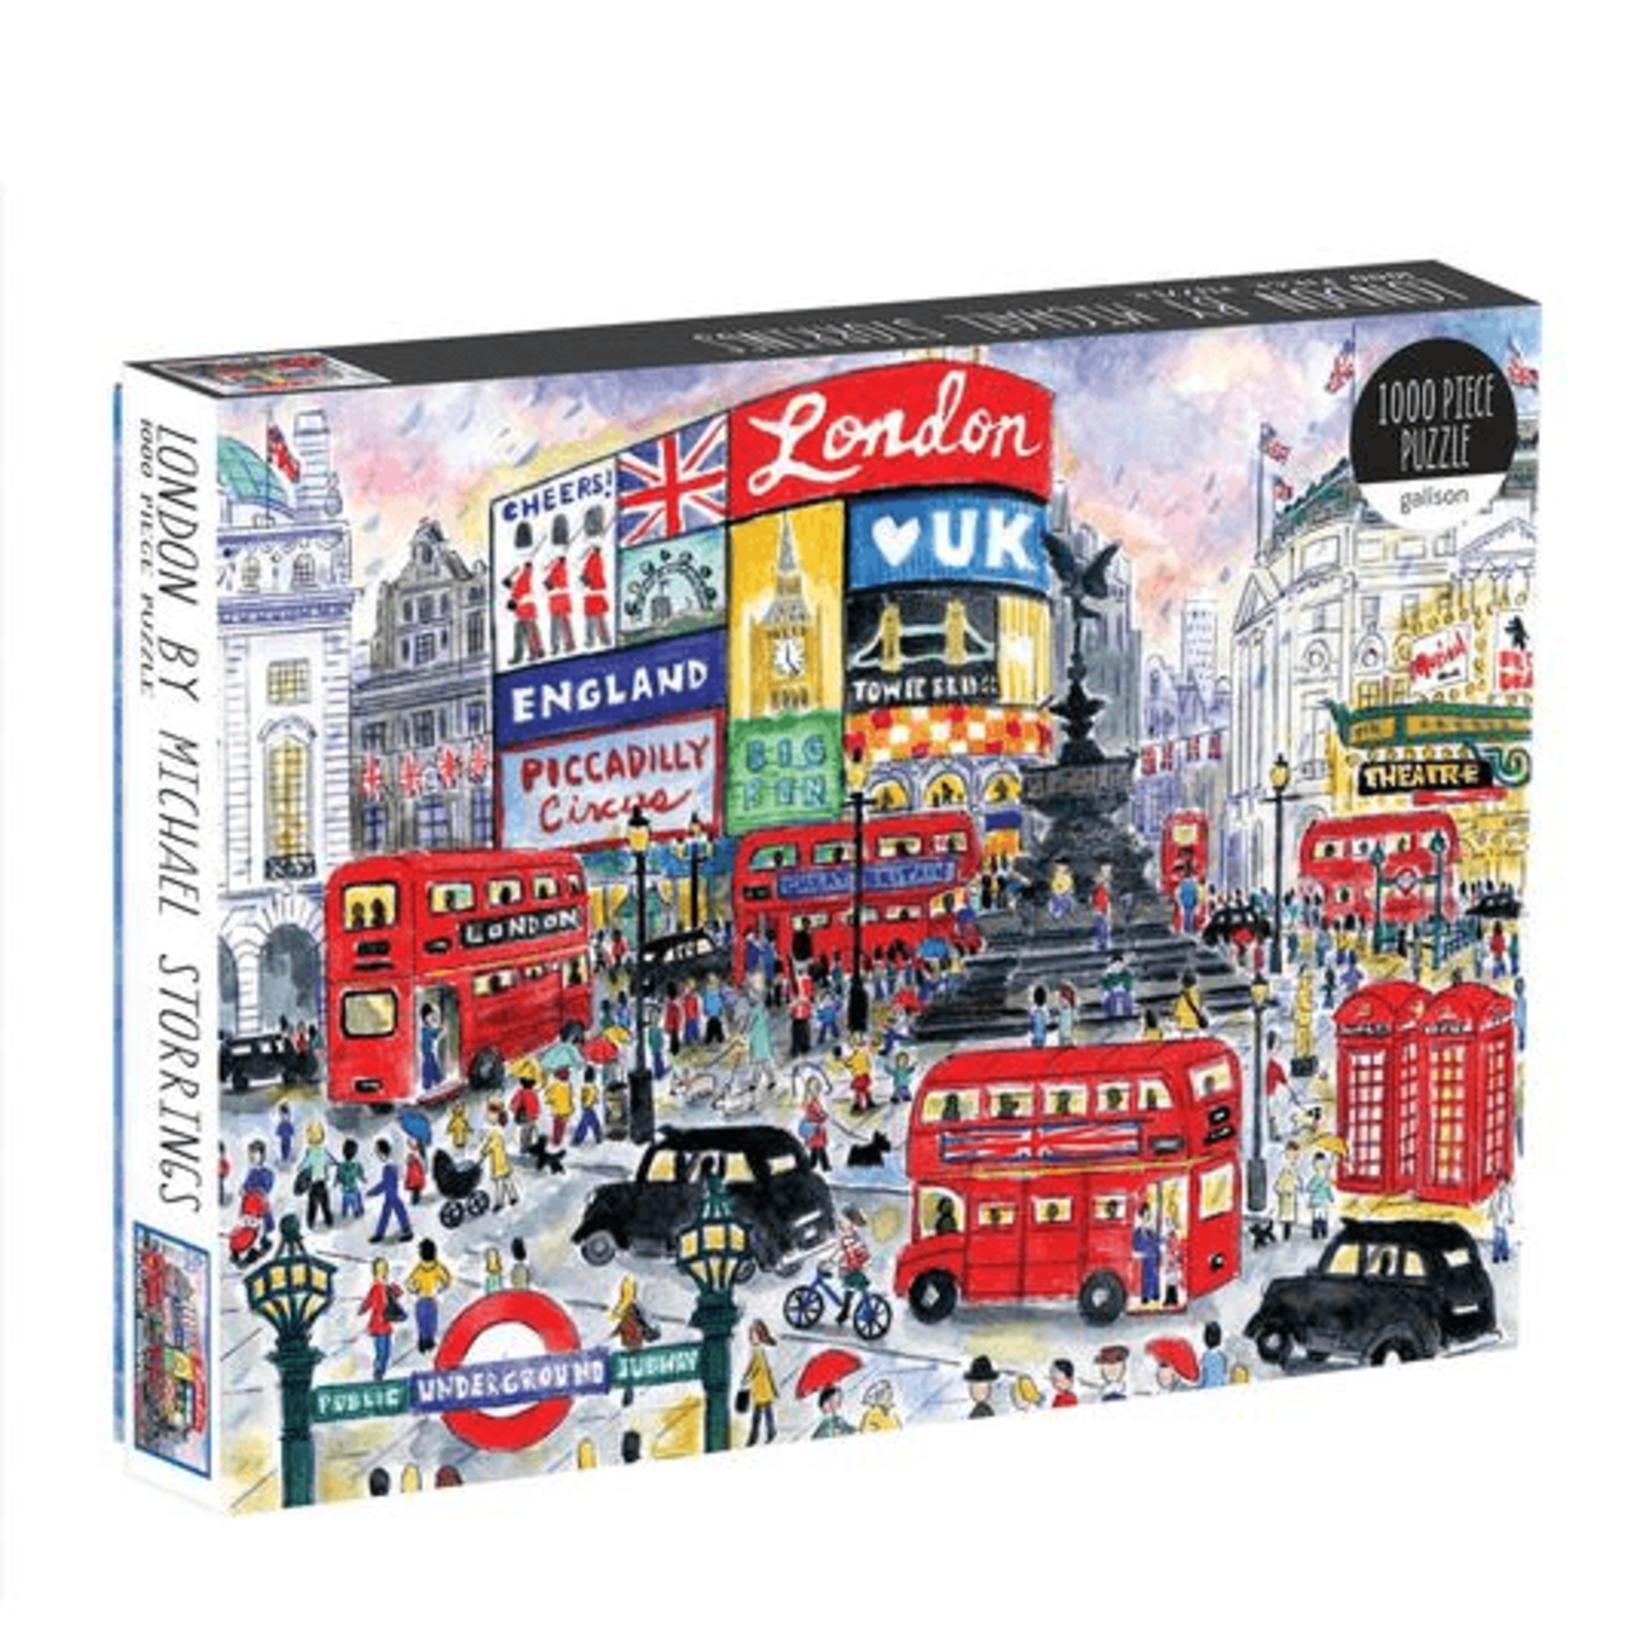 Galison London by M. Storrings 1000pc